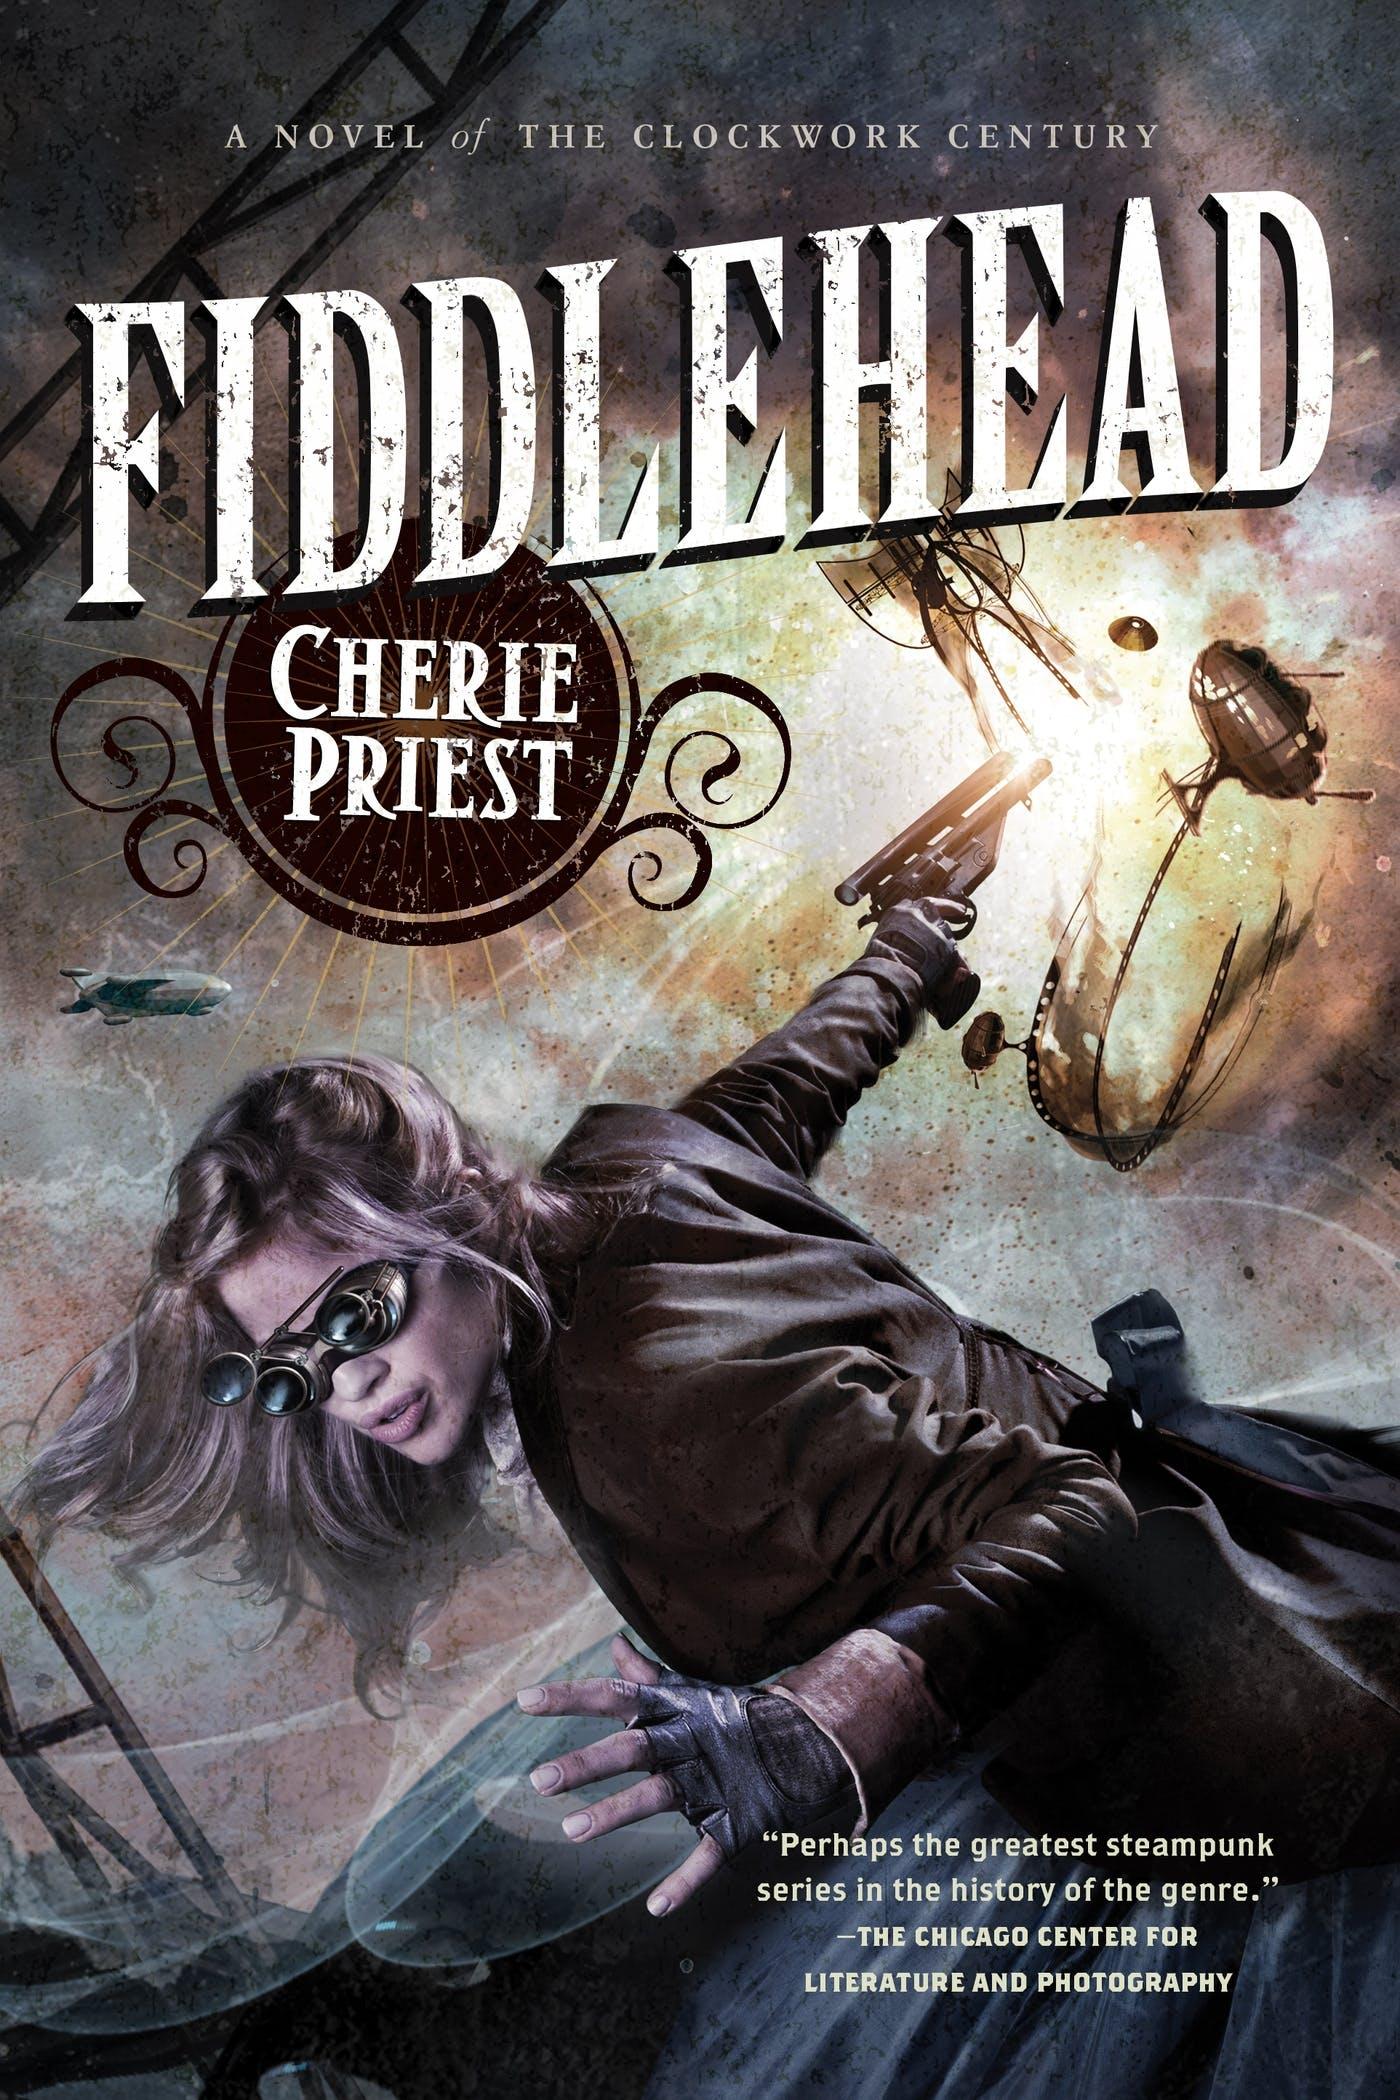 Image of Fiddlehead